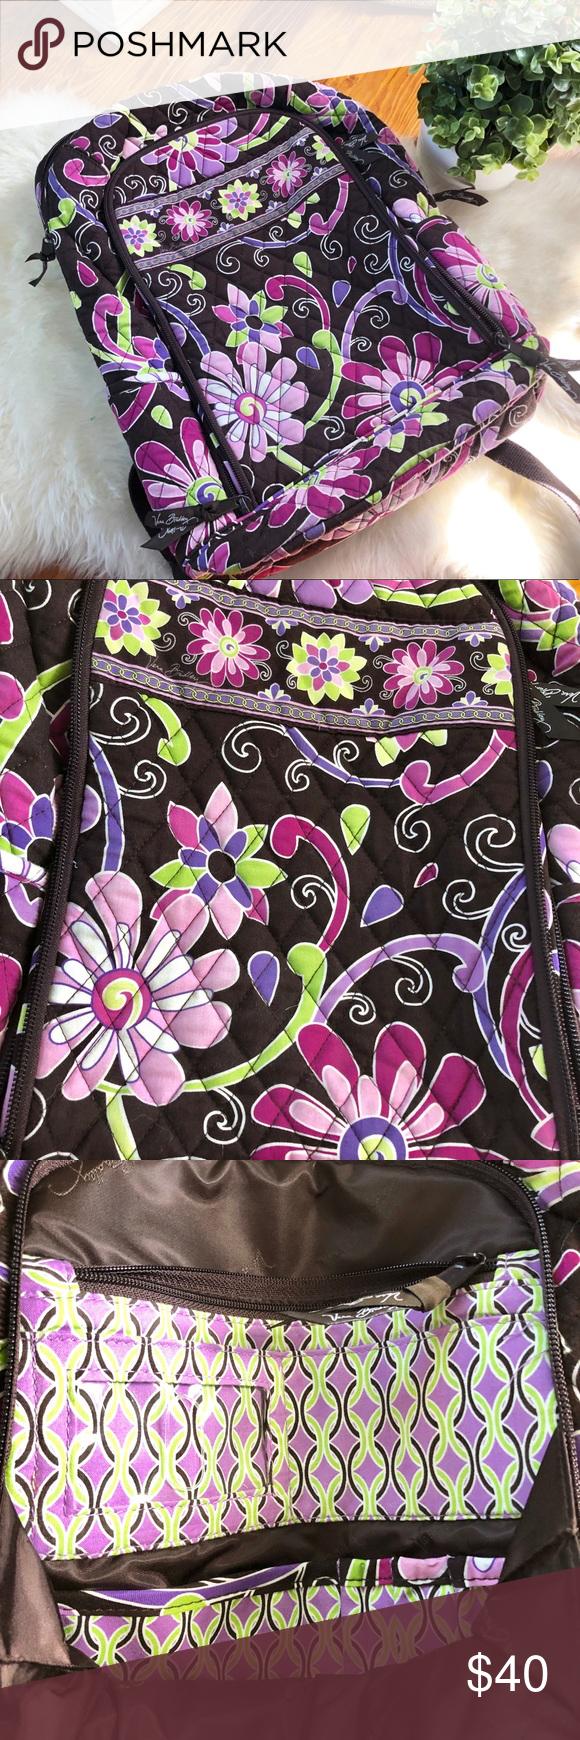 Vera Bradley Purple Punch Laptop Backpack Purple Punch (Retired pattern!) Vera  Bradley laptop ecaa058db7